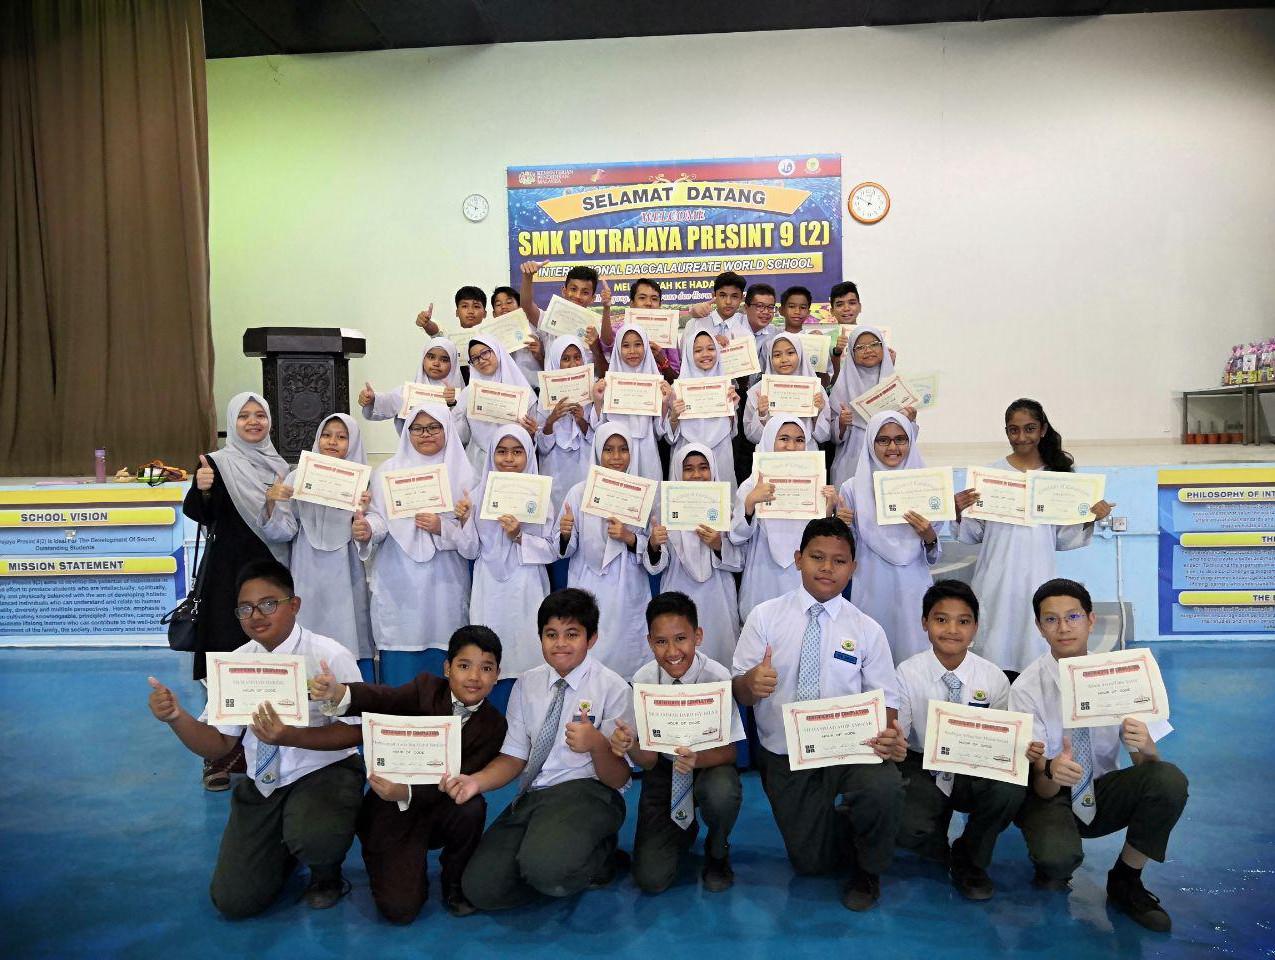 SMK Putrajaya Presint 9(2) (1)